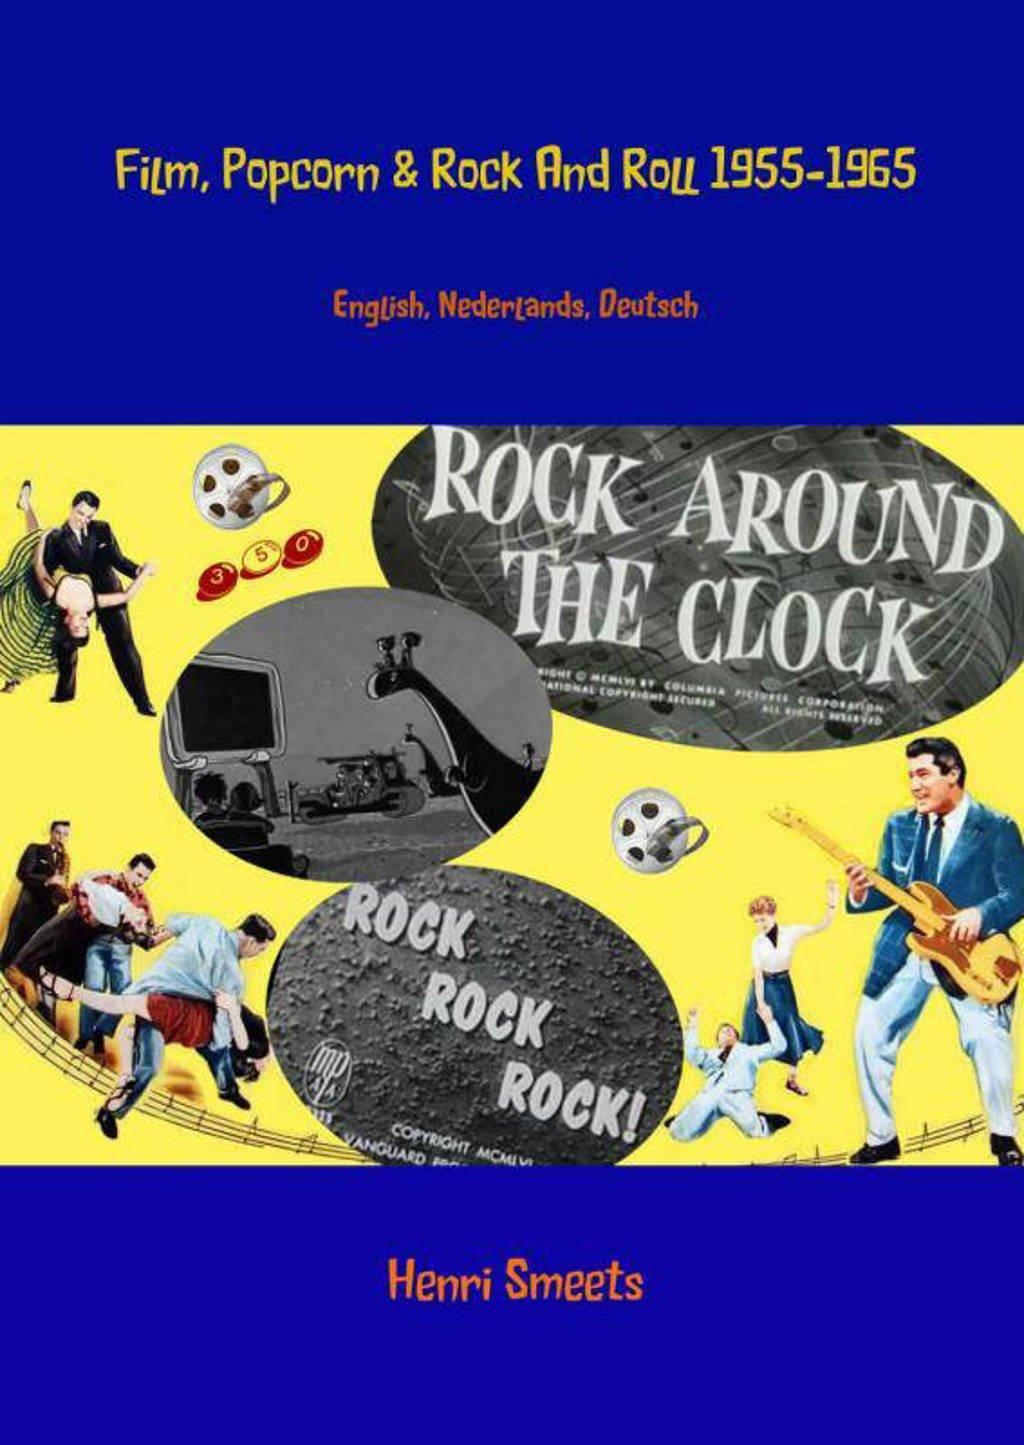 Film, popcorn en rock and roll 1955-1965 - Henri Smeets